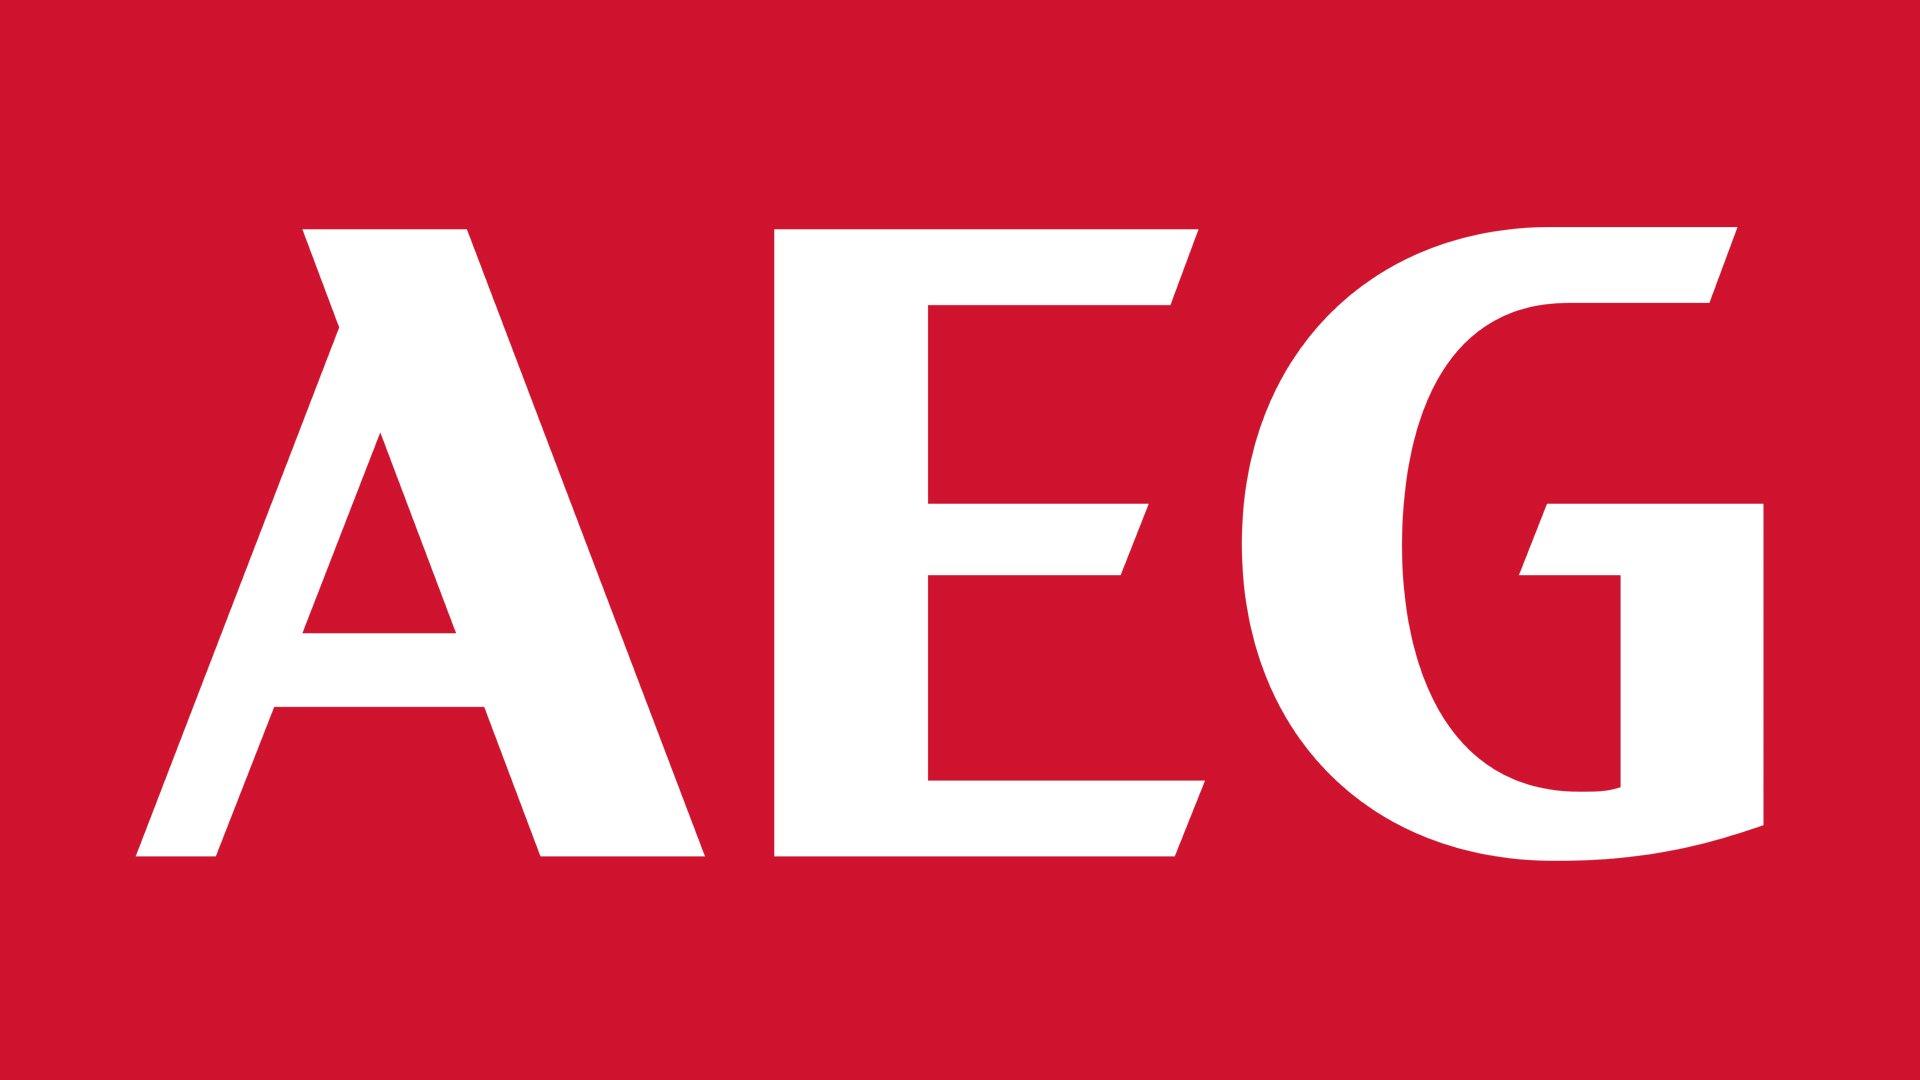 aeg logo aeg symbol meaning history and evolution. Black Bedroom Furniture Sets. Home Design Ideas